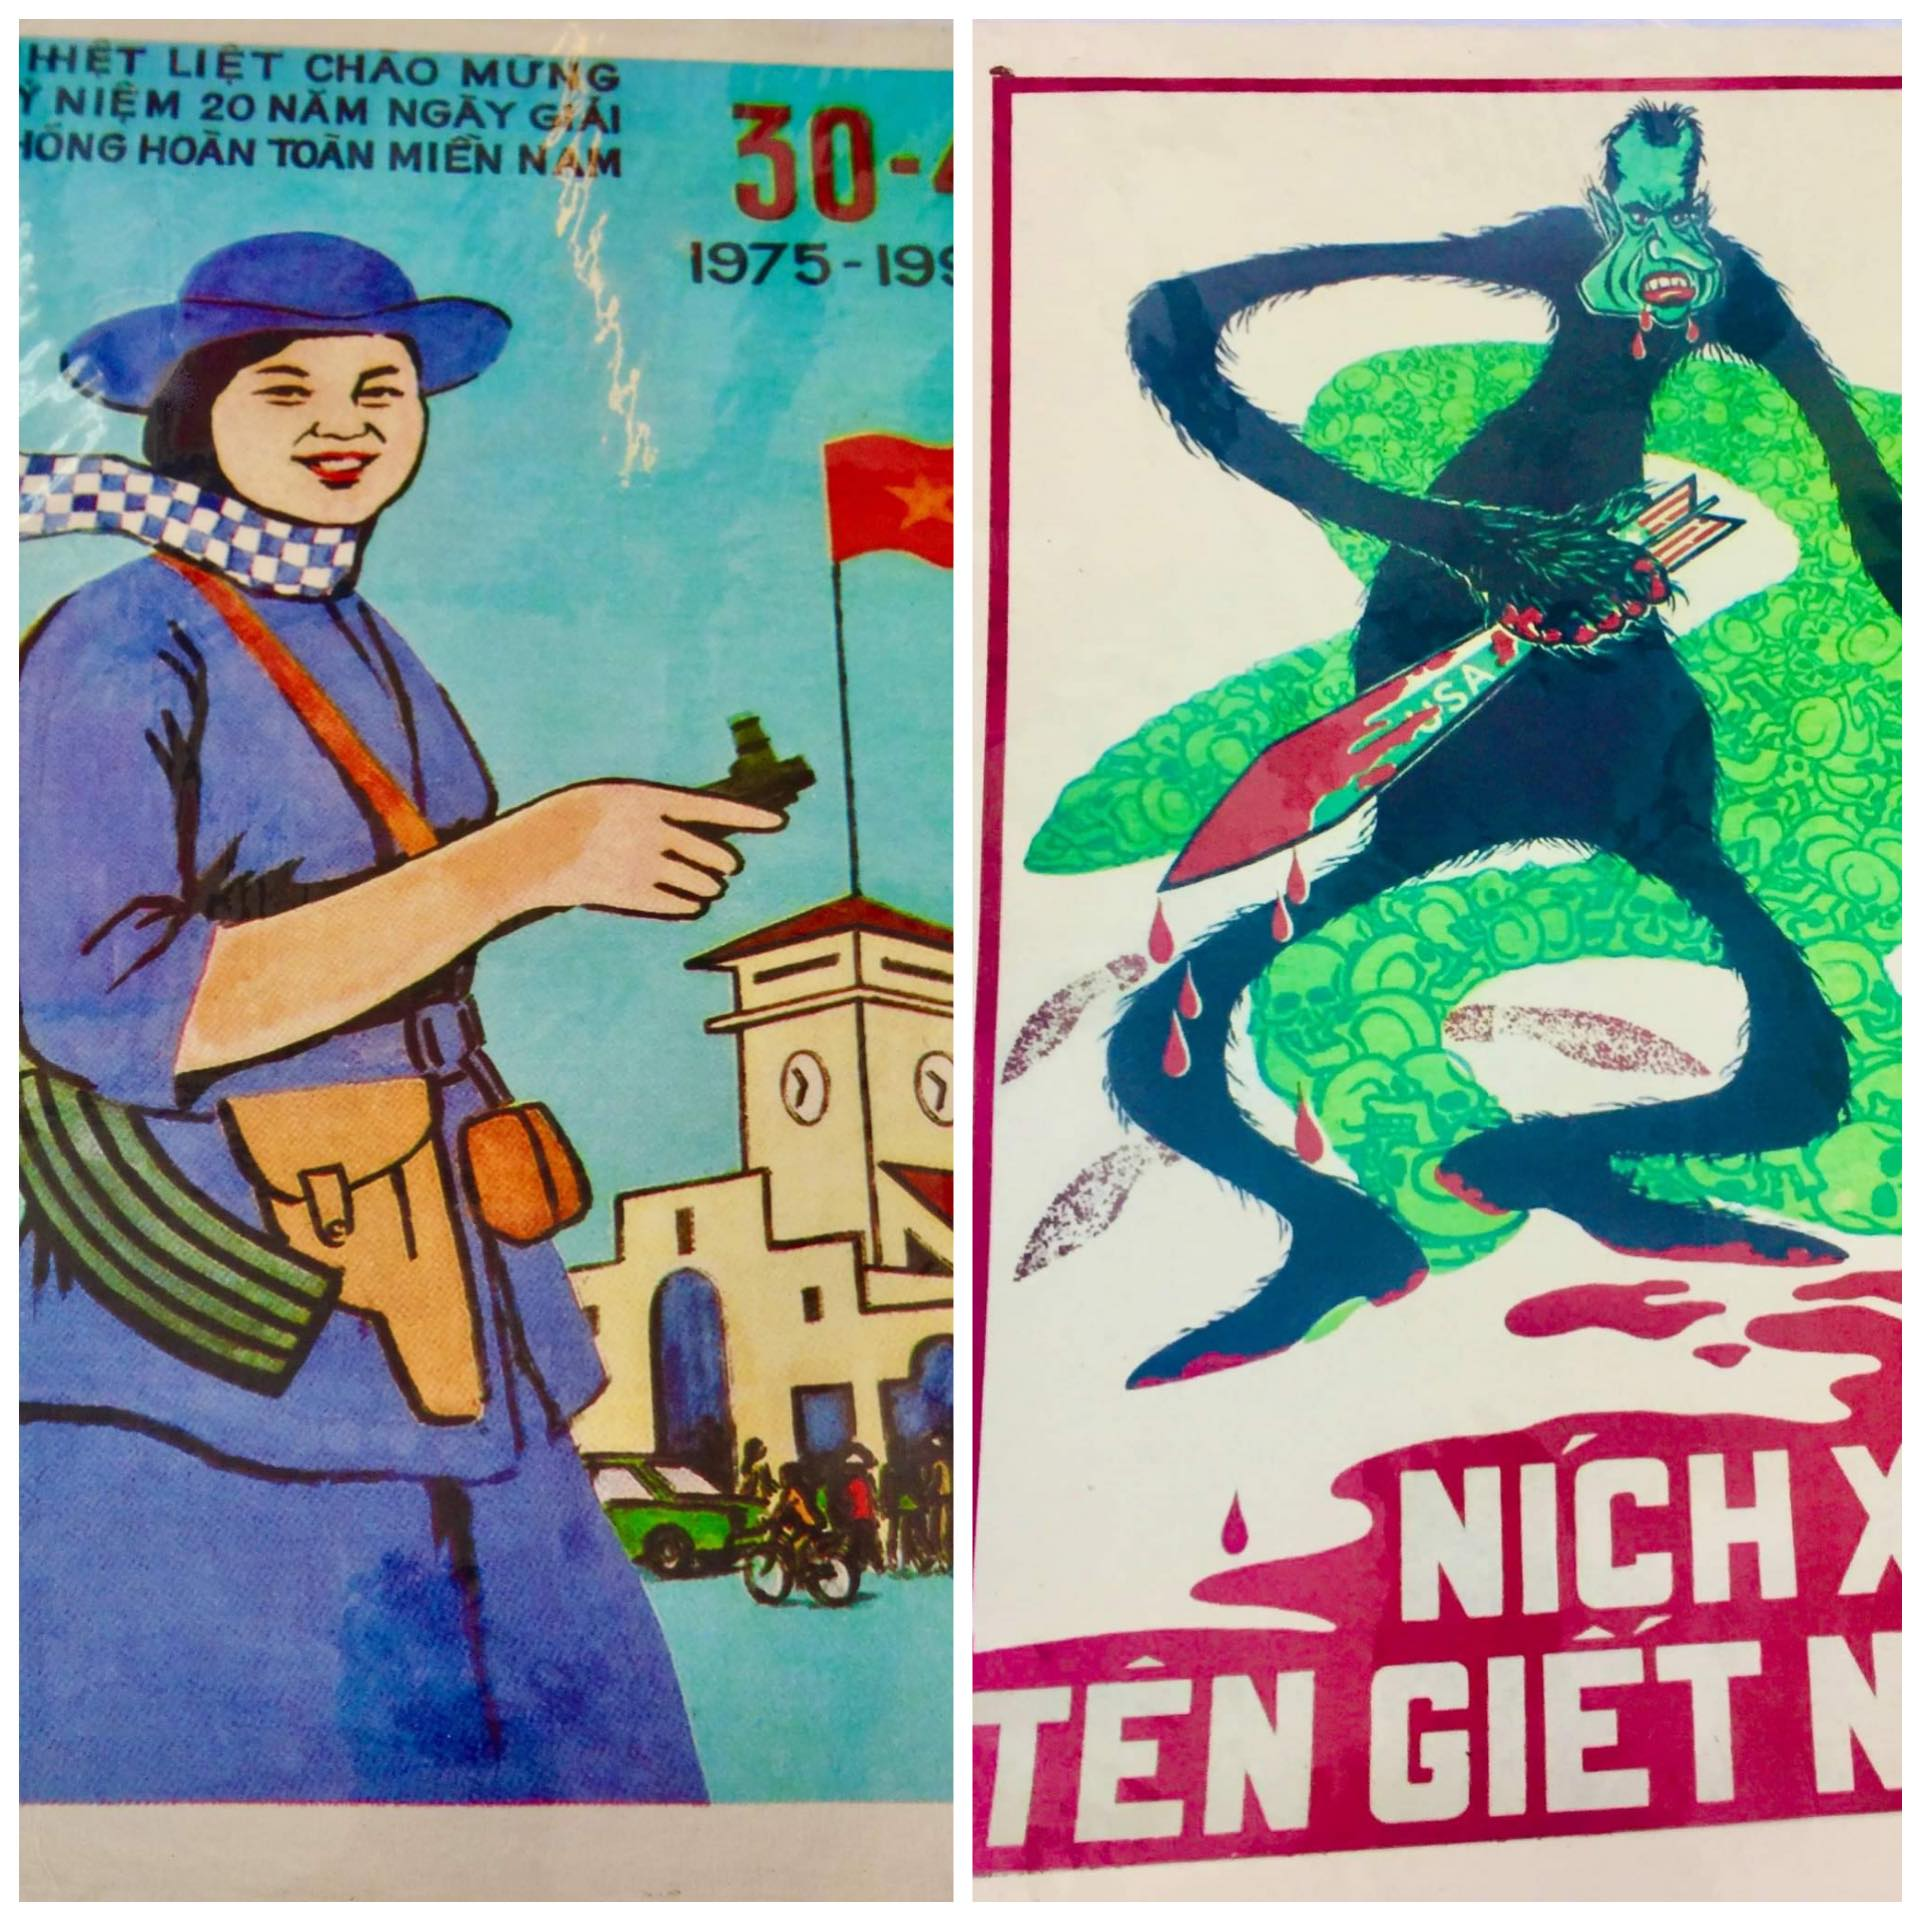 Vietnam Communist Propaganda Posters